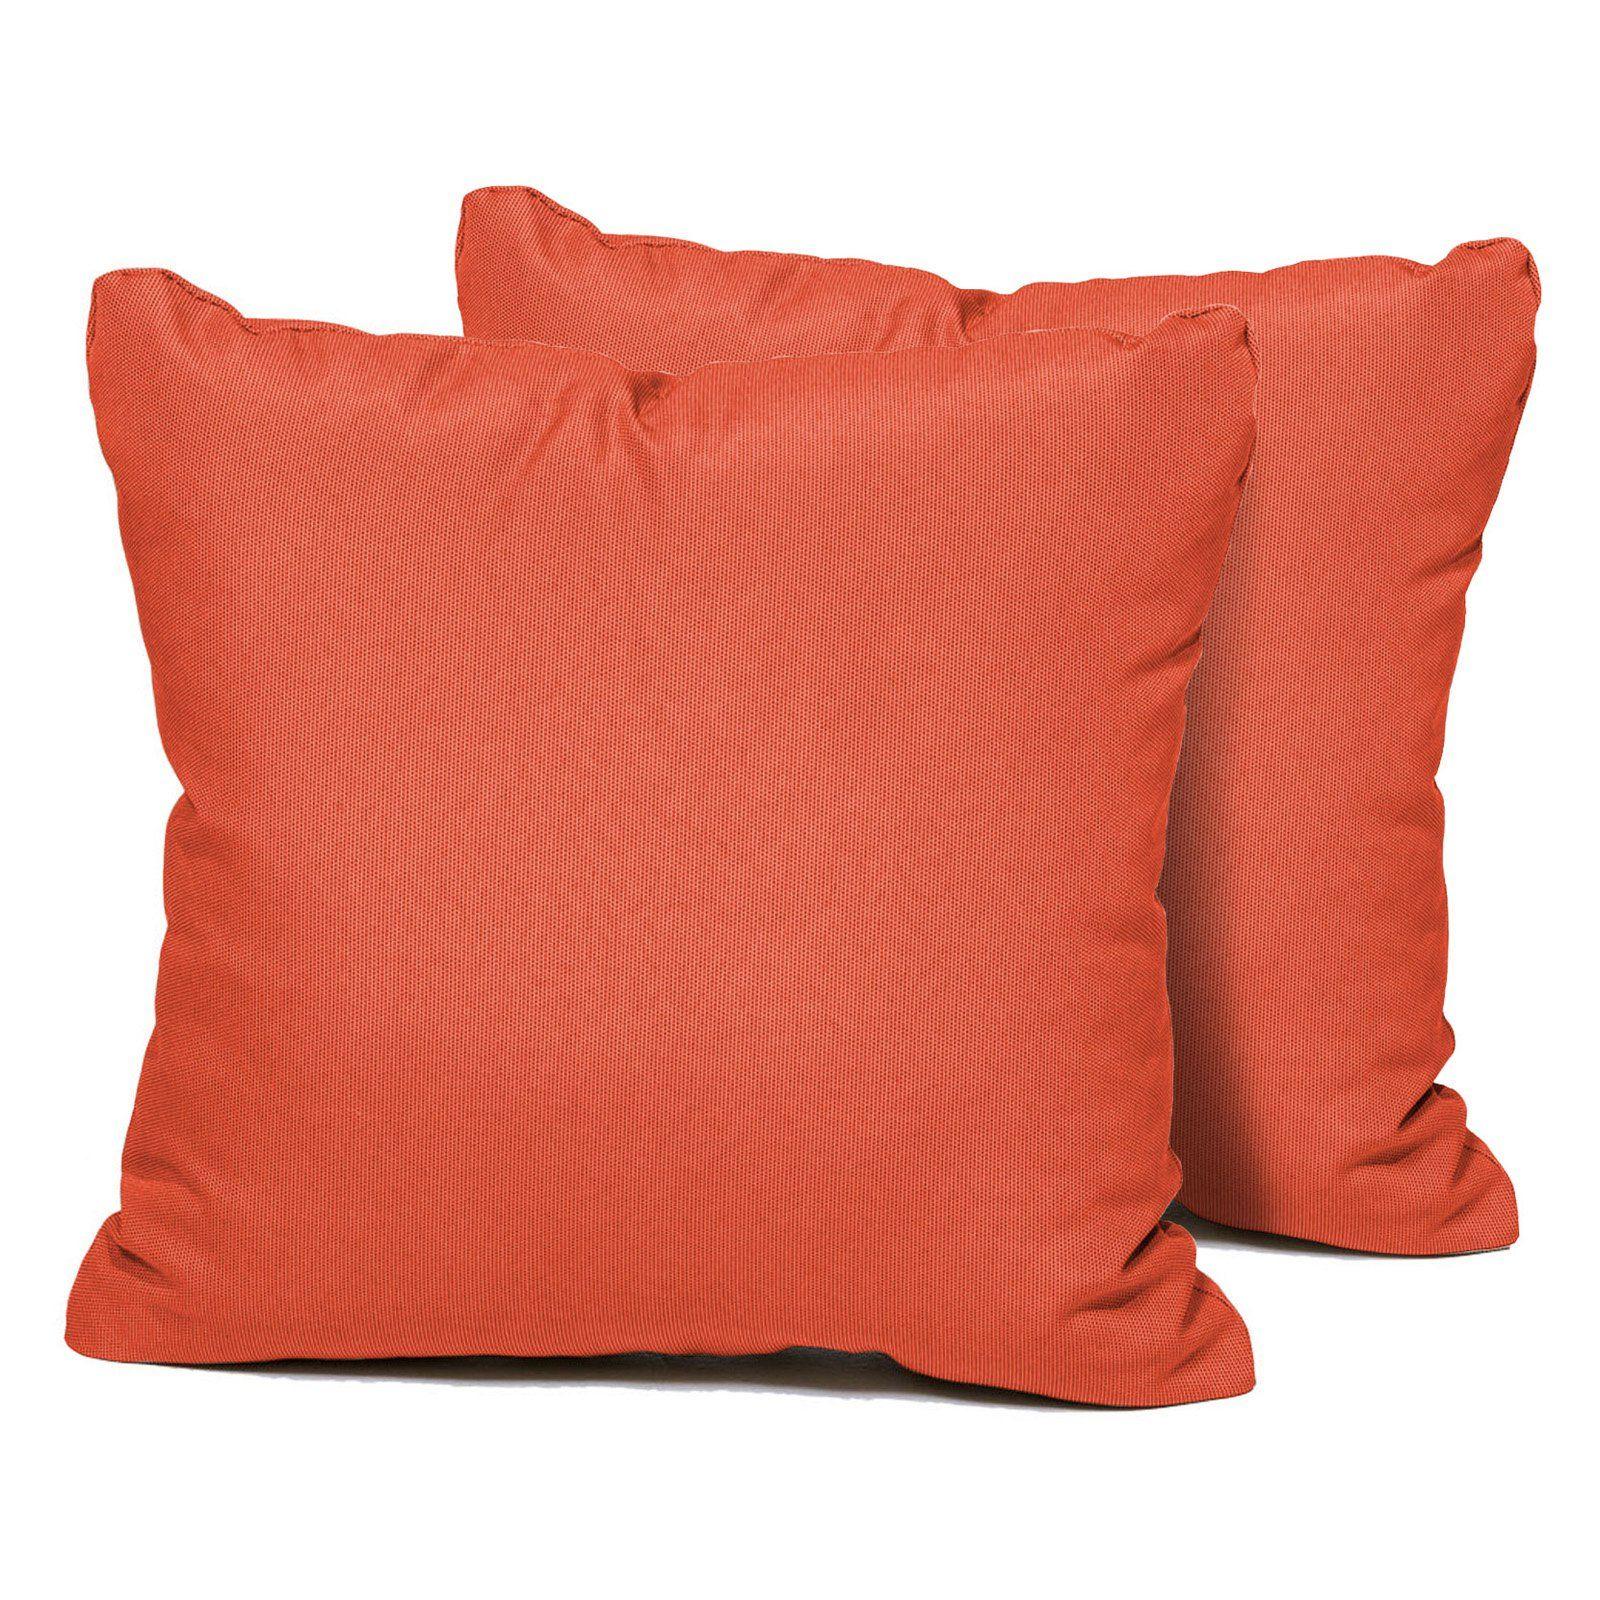 Tk Classics Decorative Outdoor Throw Pillows Set Of 2 Tangerine